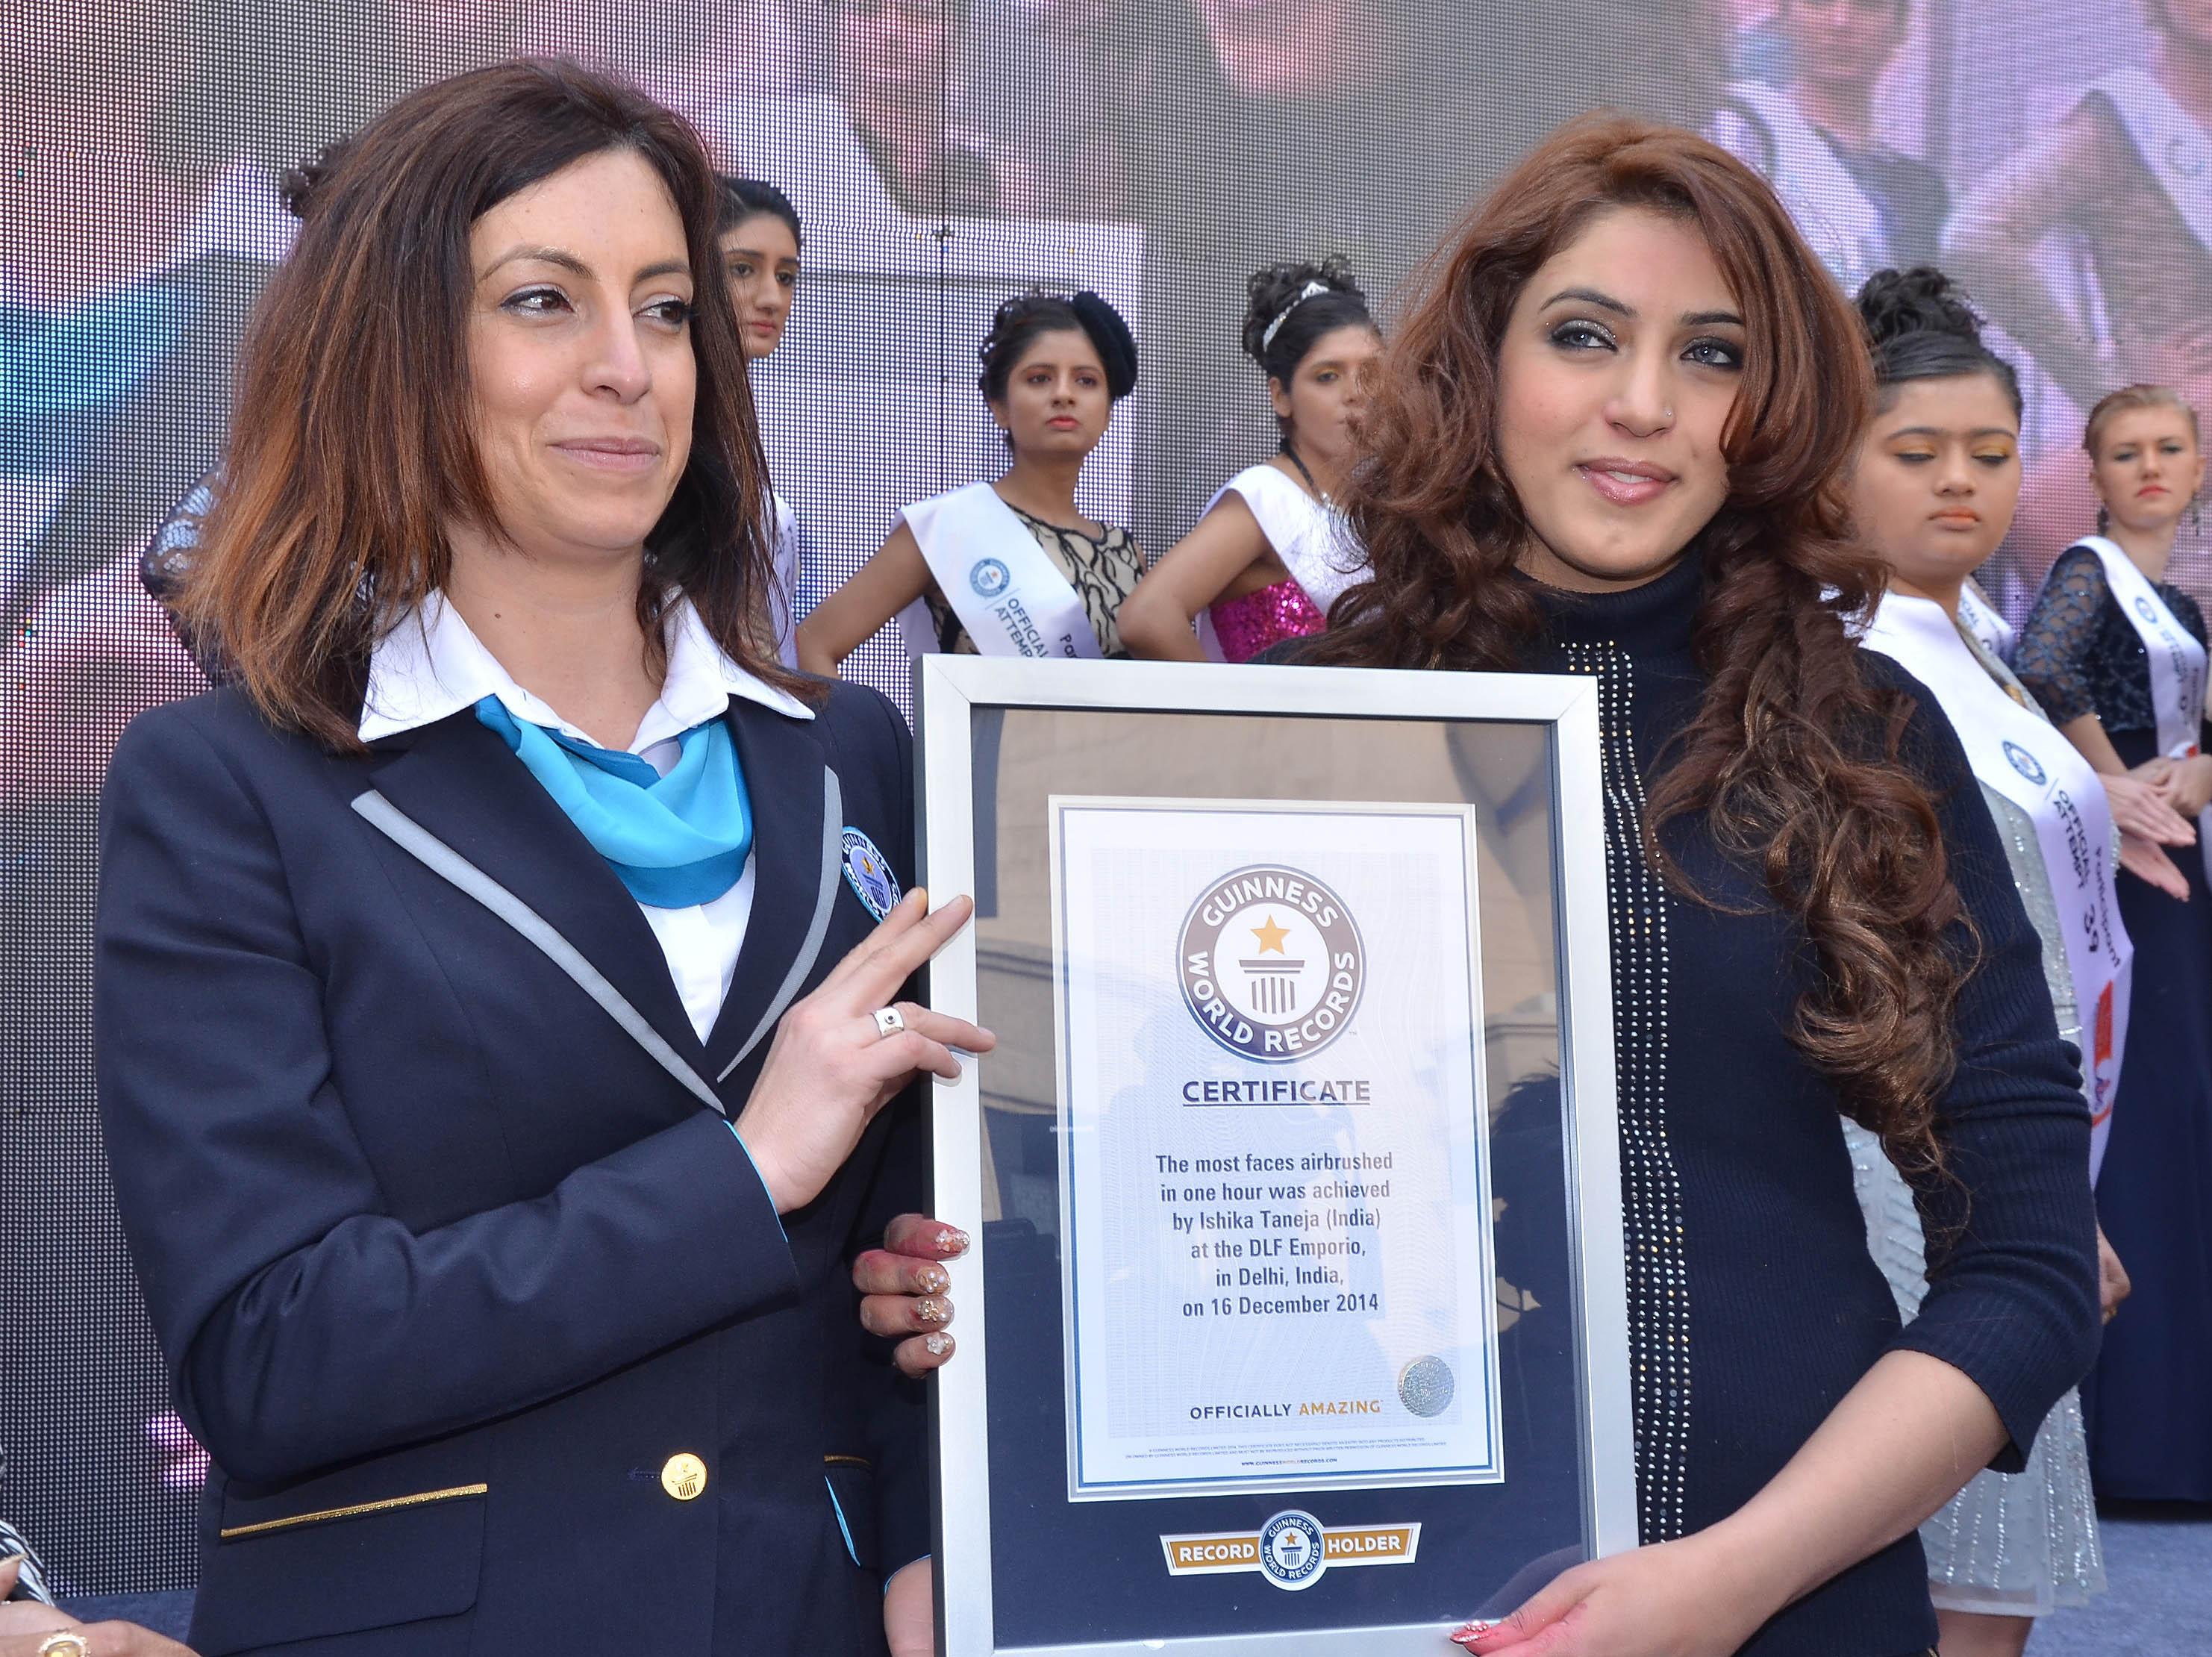 Ms Lucia Sinigagliesi, Guinness World Record official adjudicator presenting Guinness World Record award to Ishika Taneja in Capital